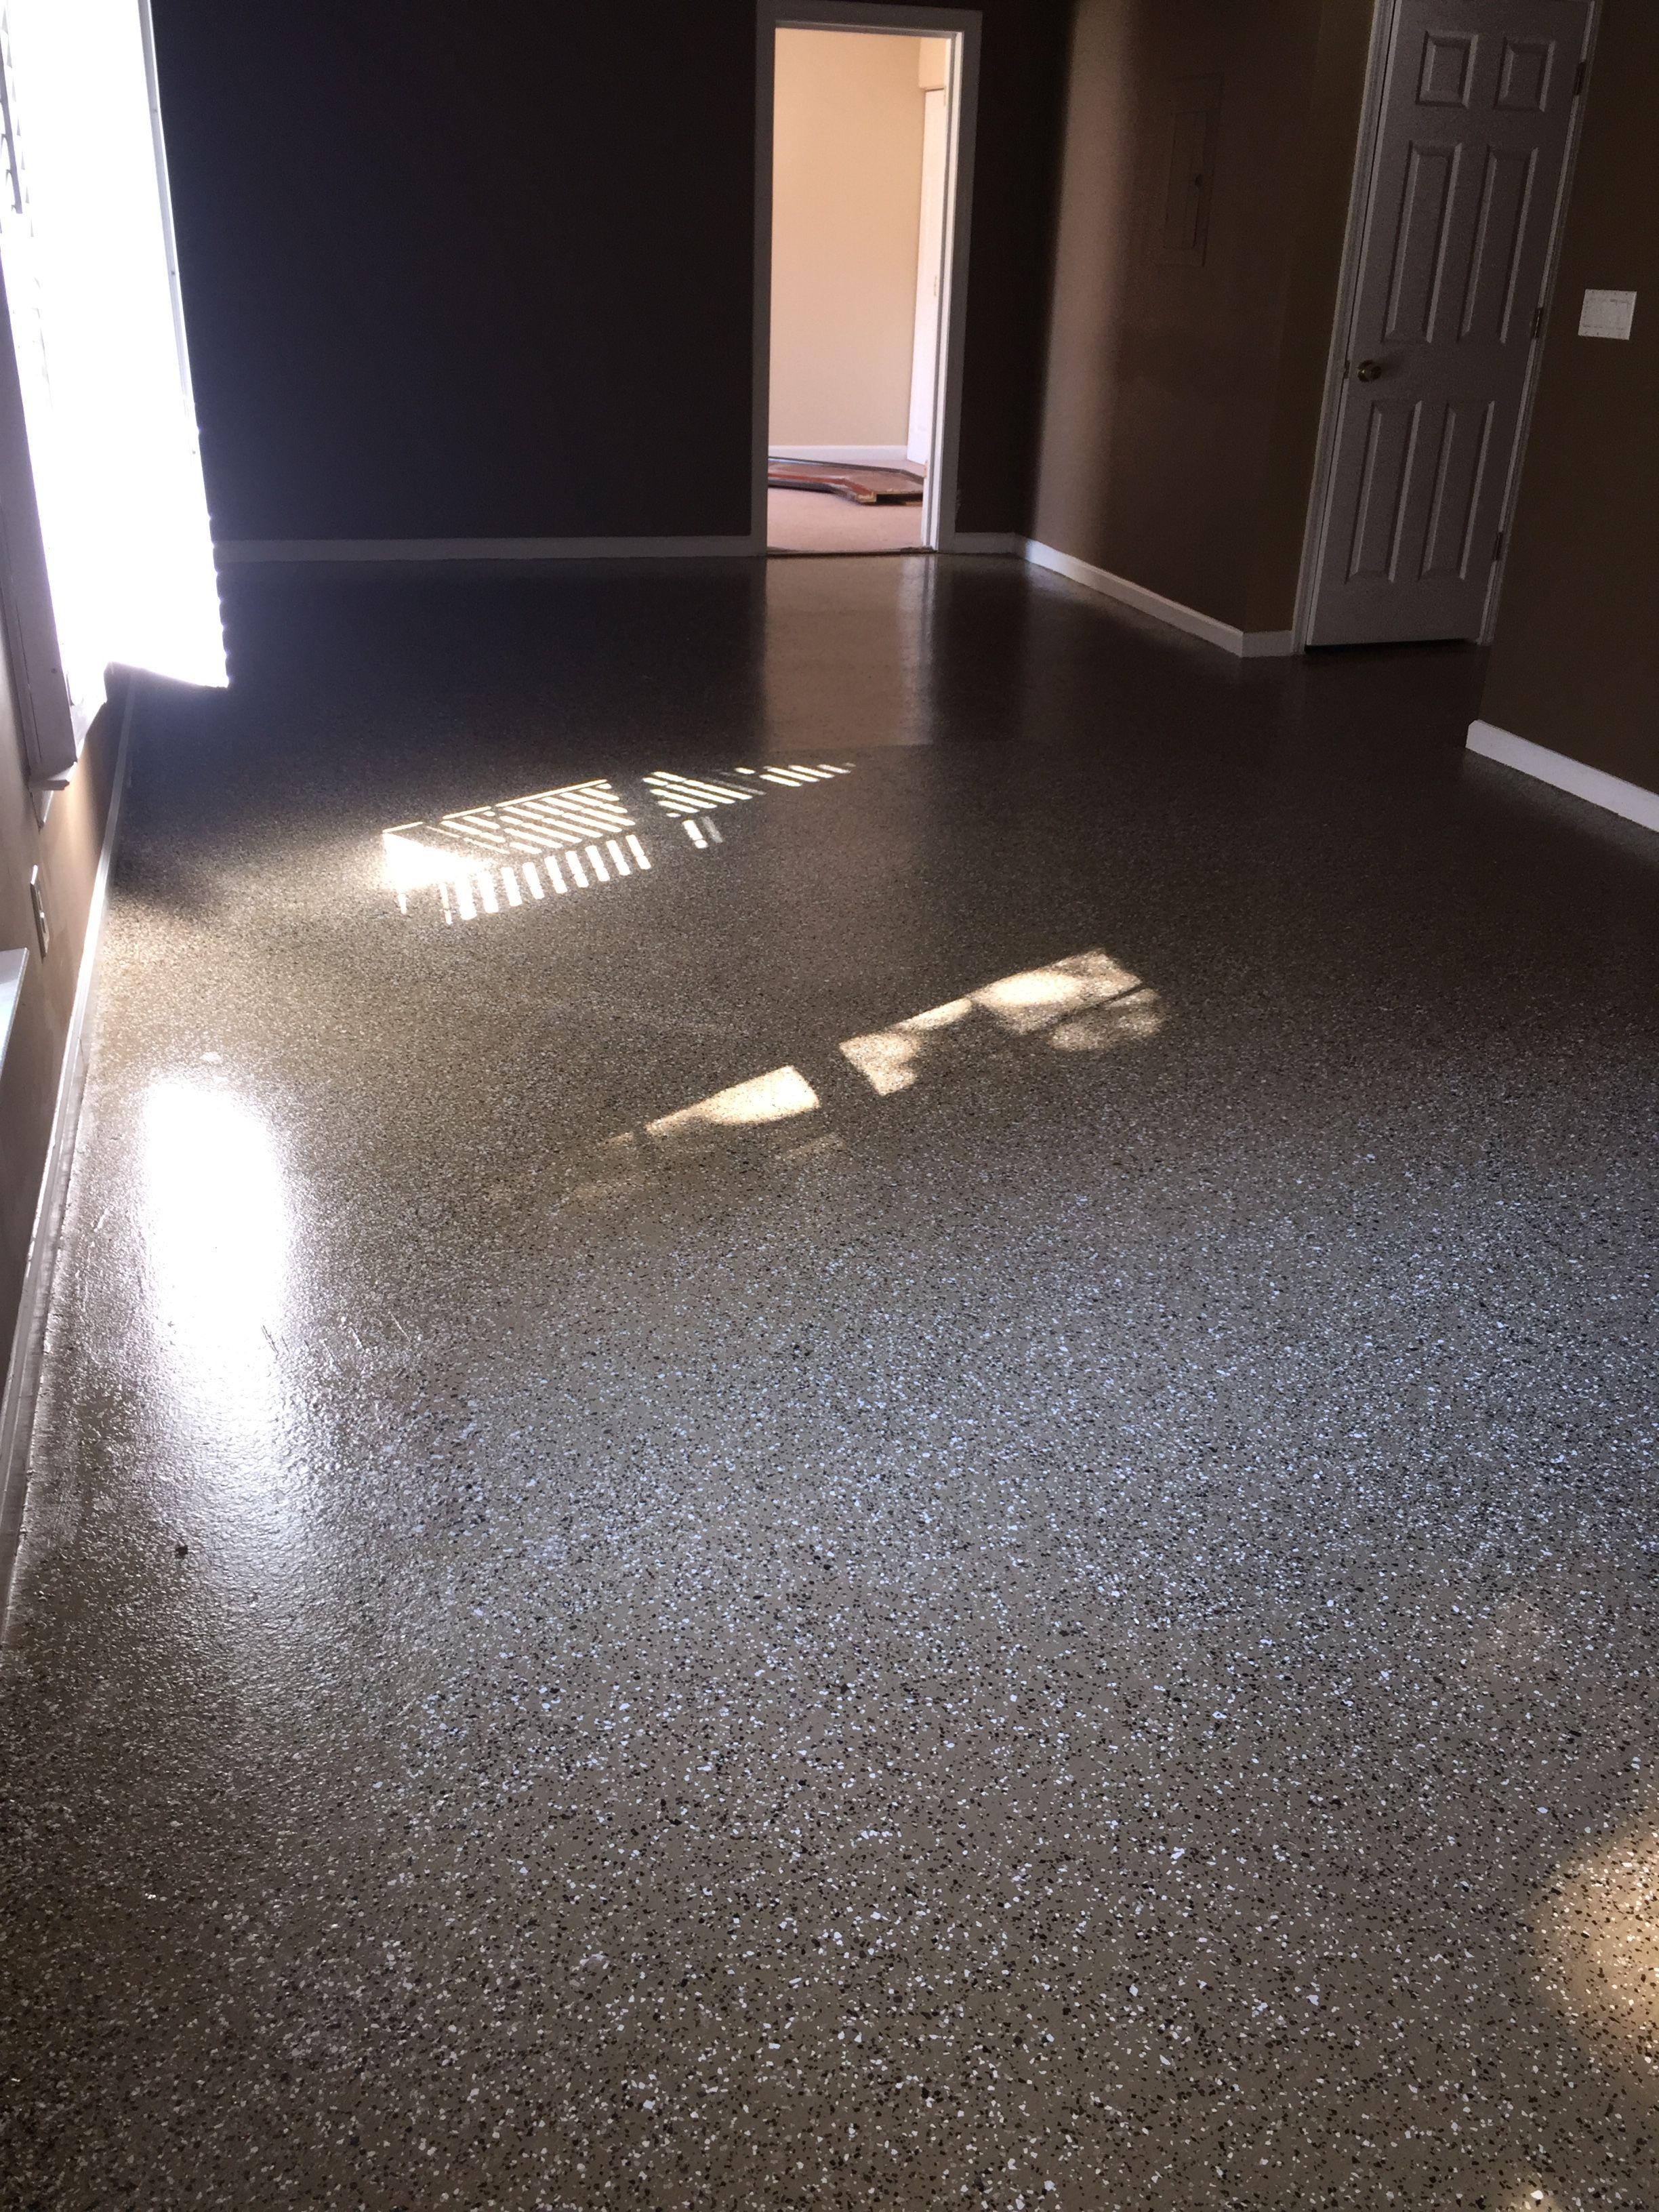 Epoxy Basement Floors Are Better Than Carpet Floors Why Moisture Issues Basement Flooring Epoxy Floor Basement Finishing Basement